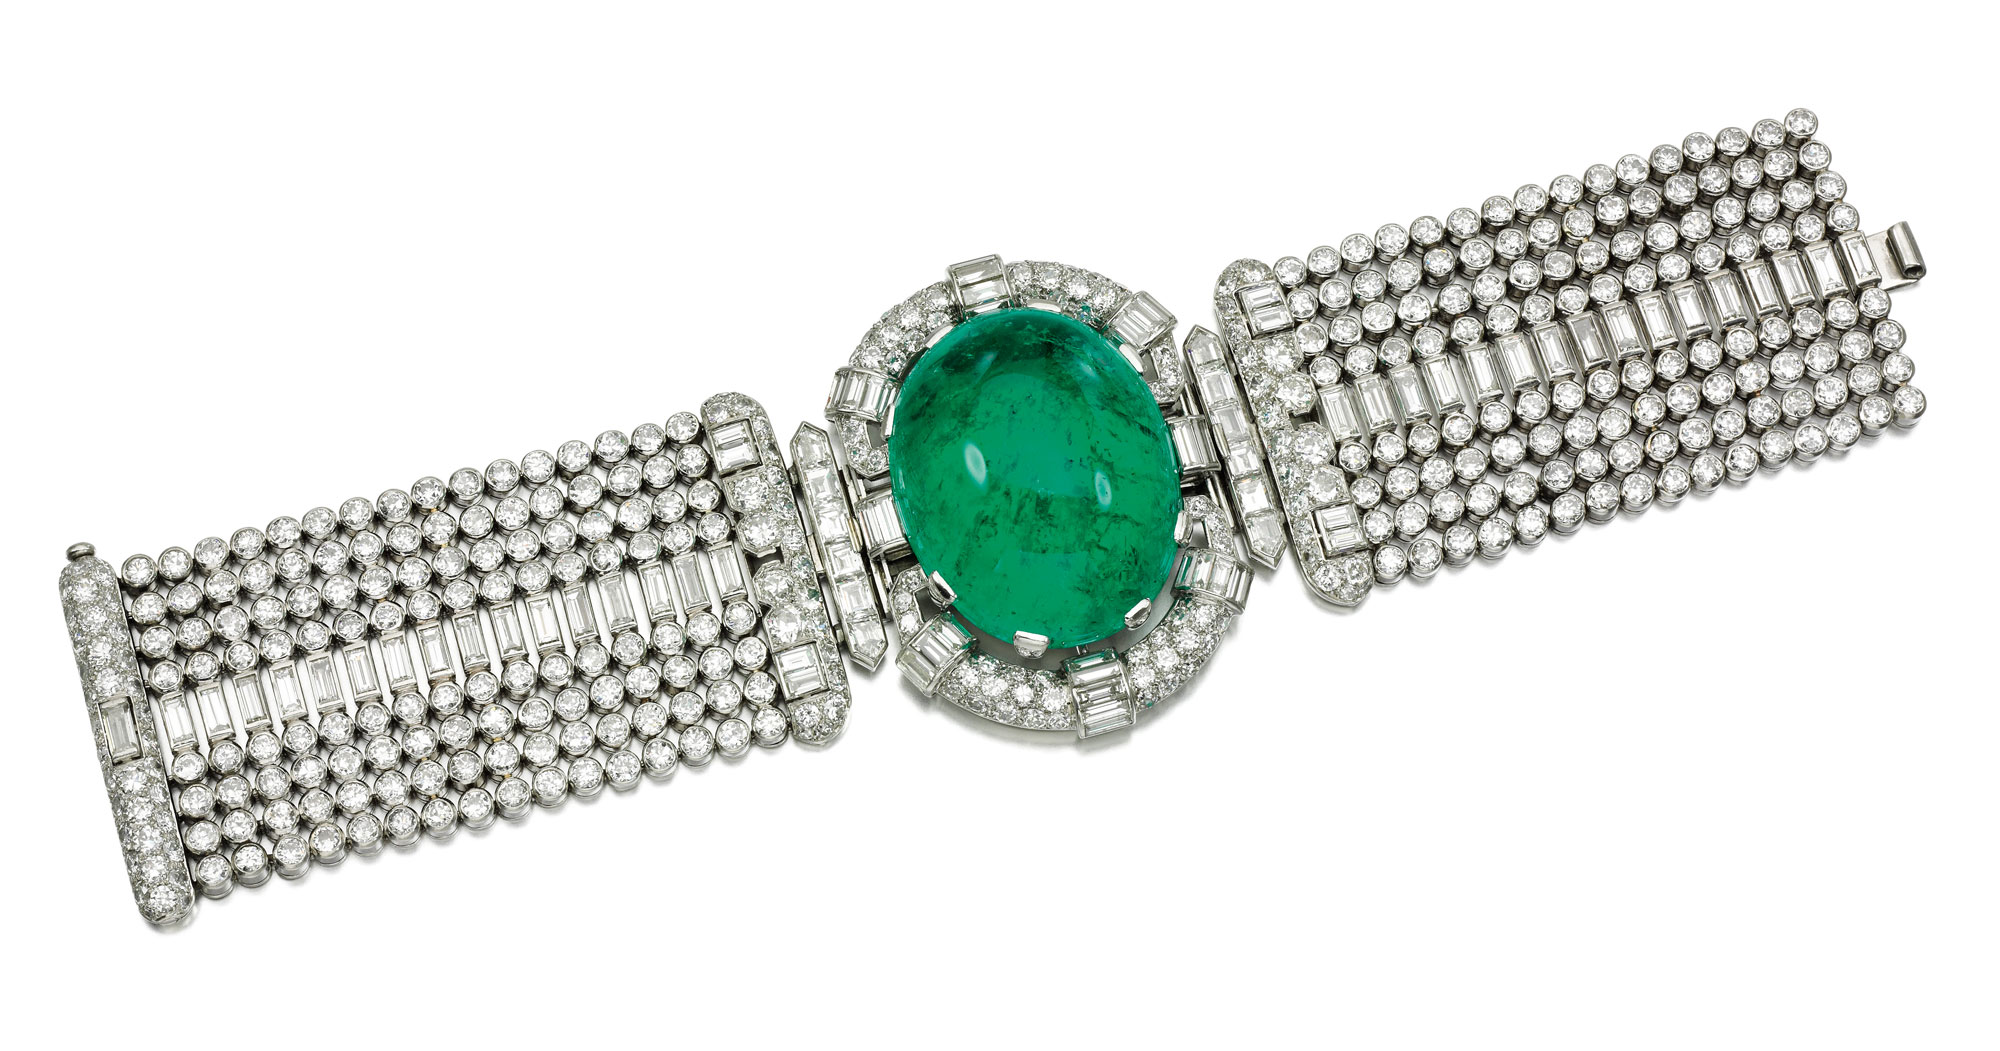 emerald and diamon bracelet - credit Sotheby's-1